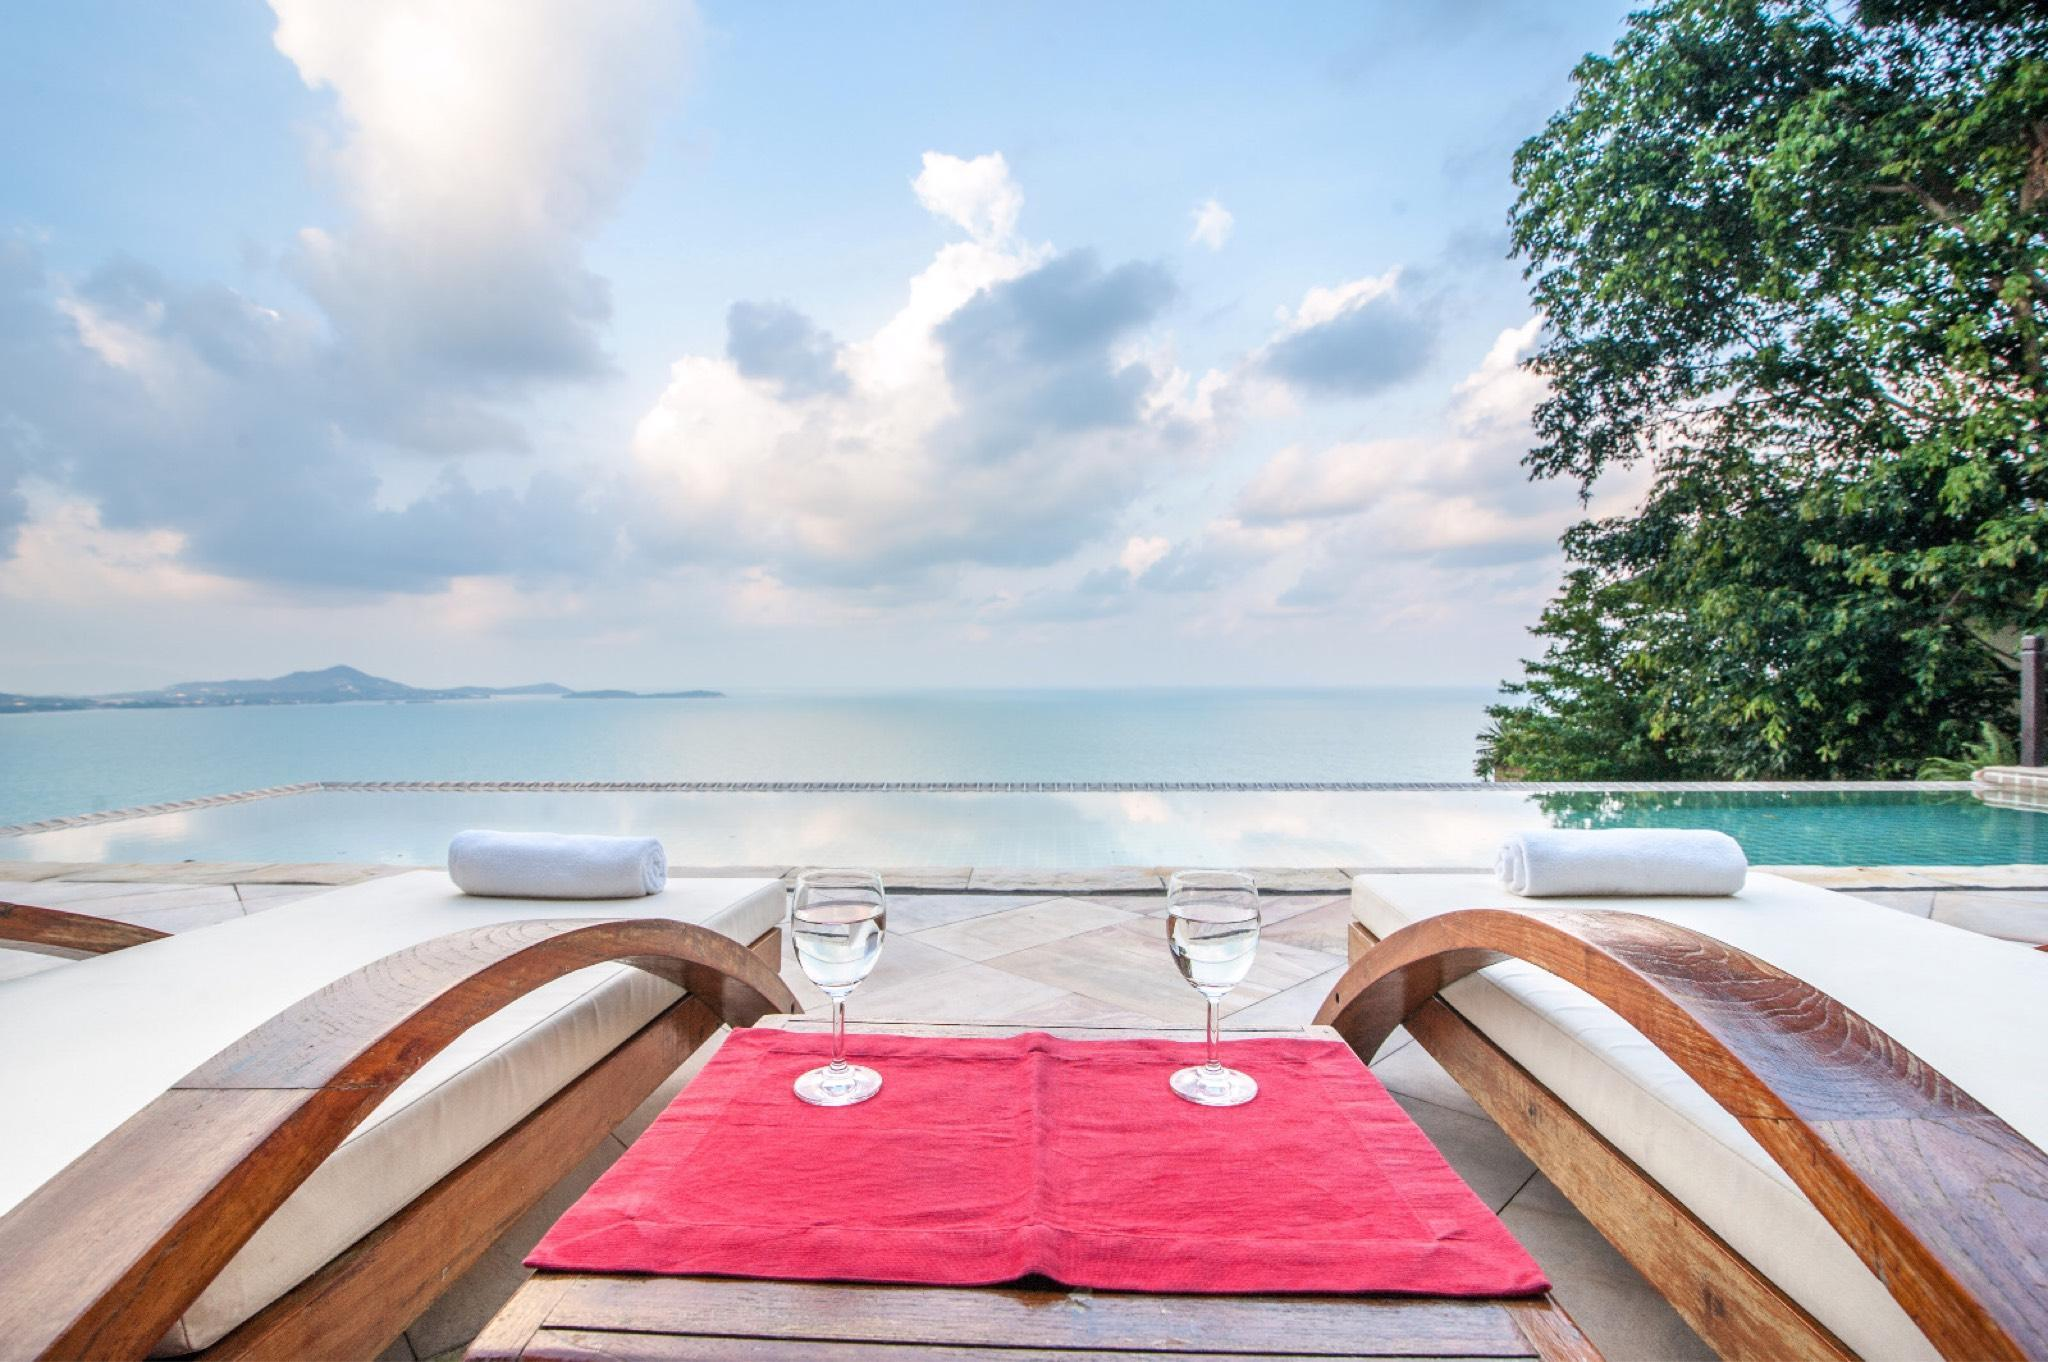 Villa LOTUS Infinity Pool With Seaview 3 BR